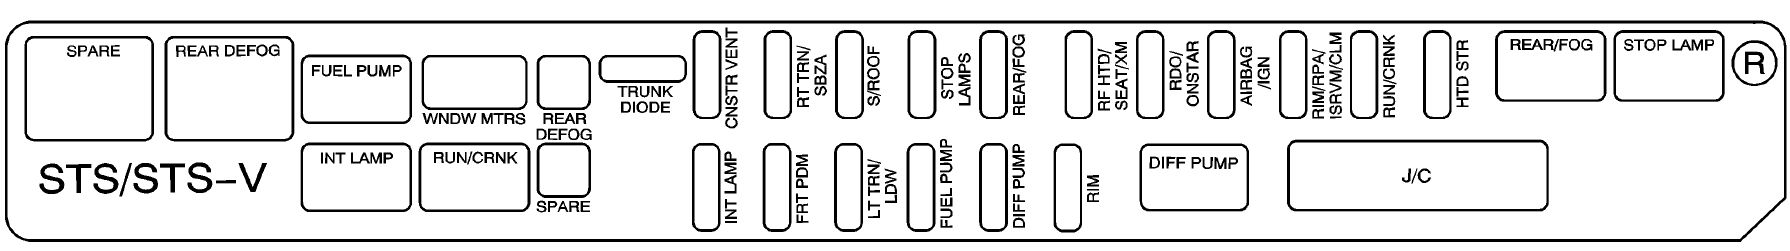 [ZHKZ_3066]  2005 Cadillac Cts Fuse Box Diagram For Stove Schematic Wiring Diagram -  sulau.29.allianceconseil59.fr | 2005 Cts Fuse Box Inside |  | Wiring Diagram and Schematics